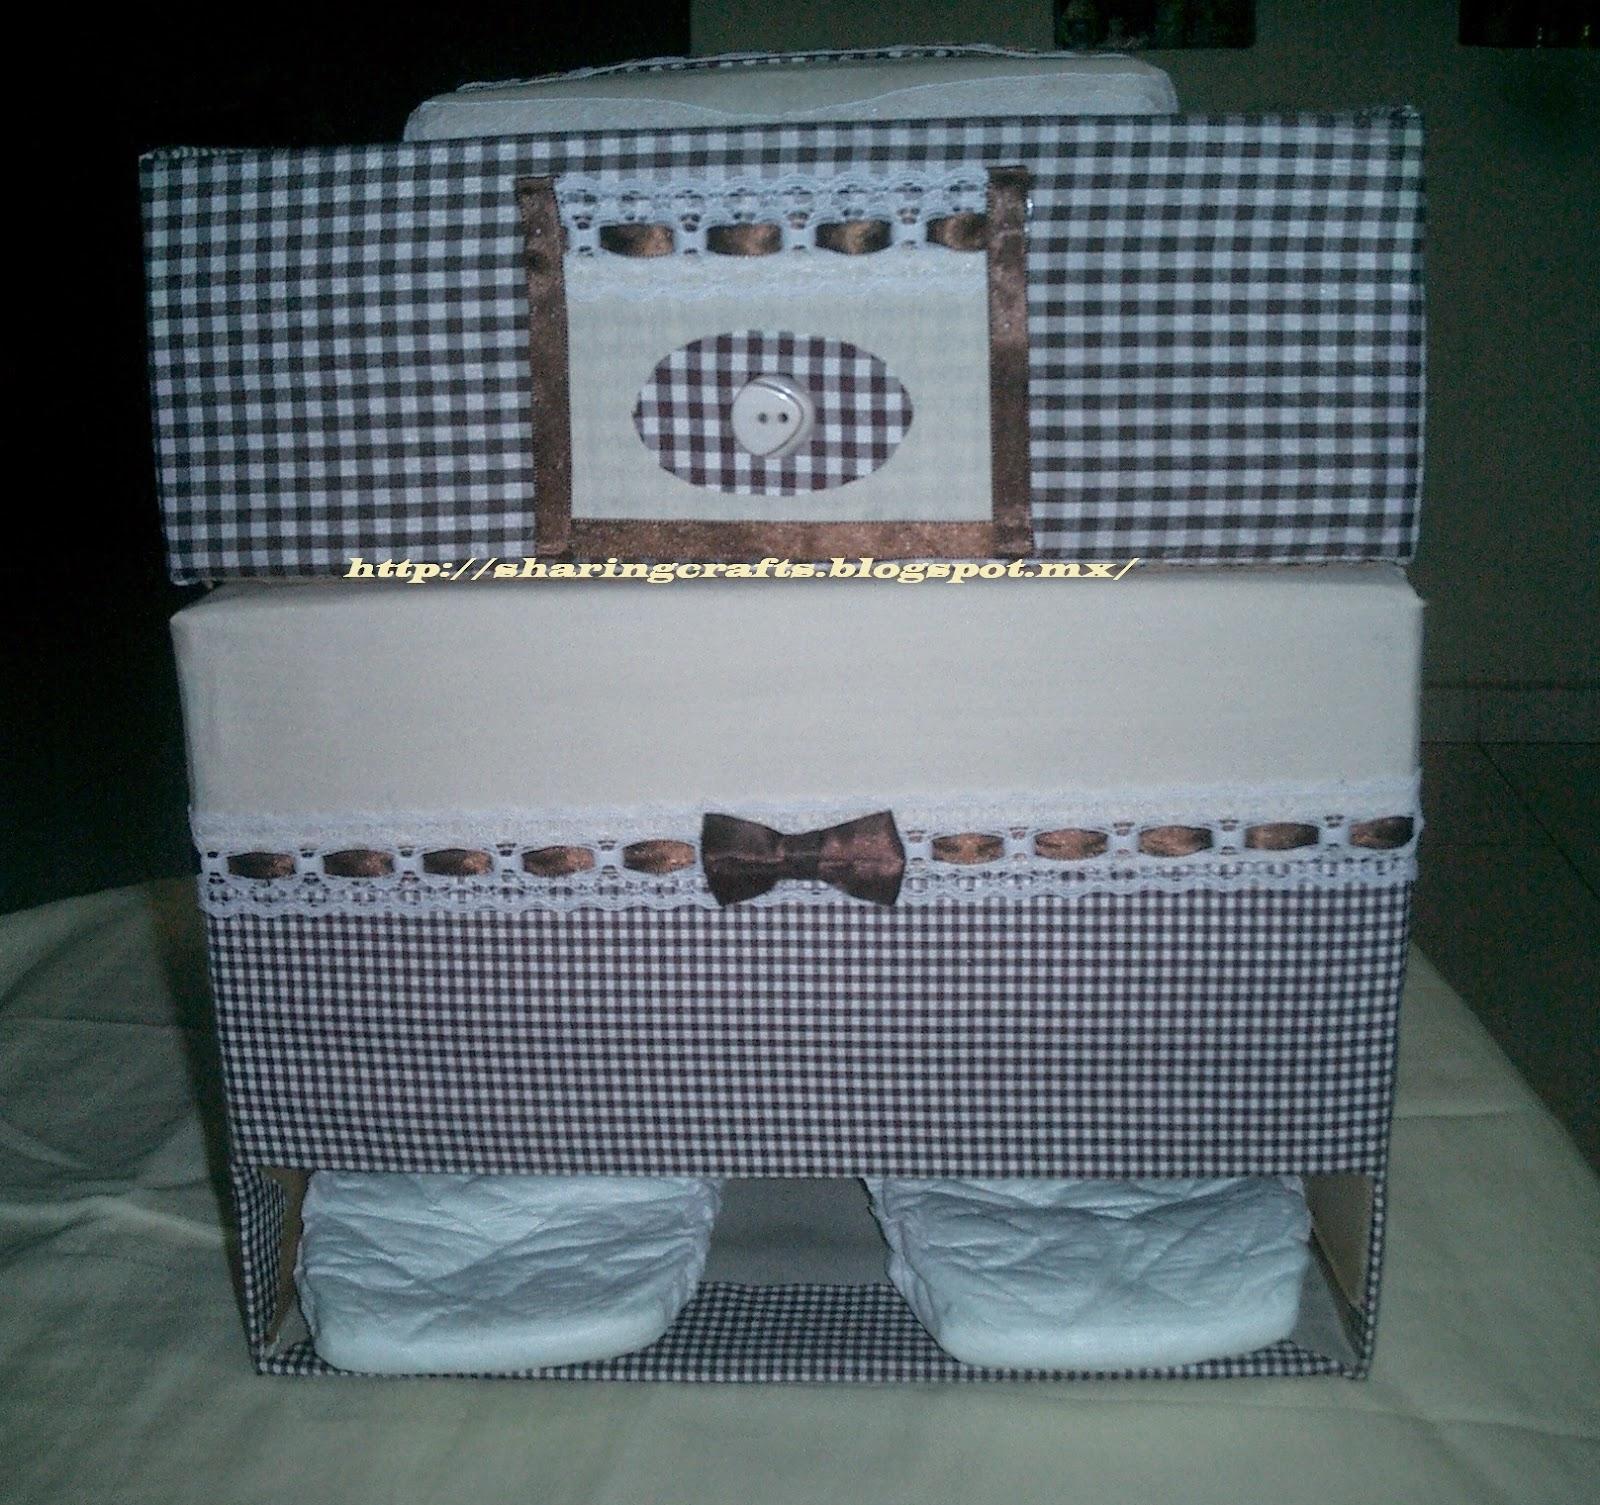 Ah como hacer manualidades sencillas paso a paso - Cajas de carton decoradas para bebes ...